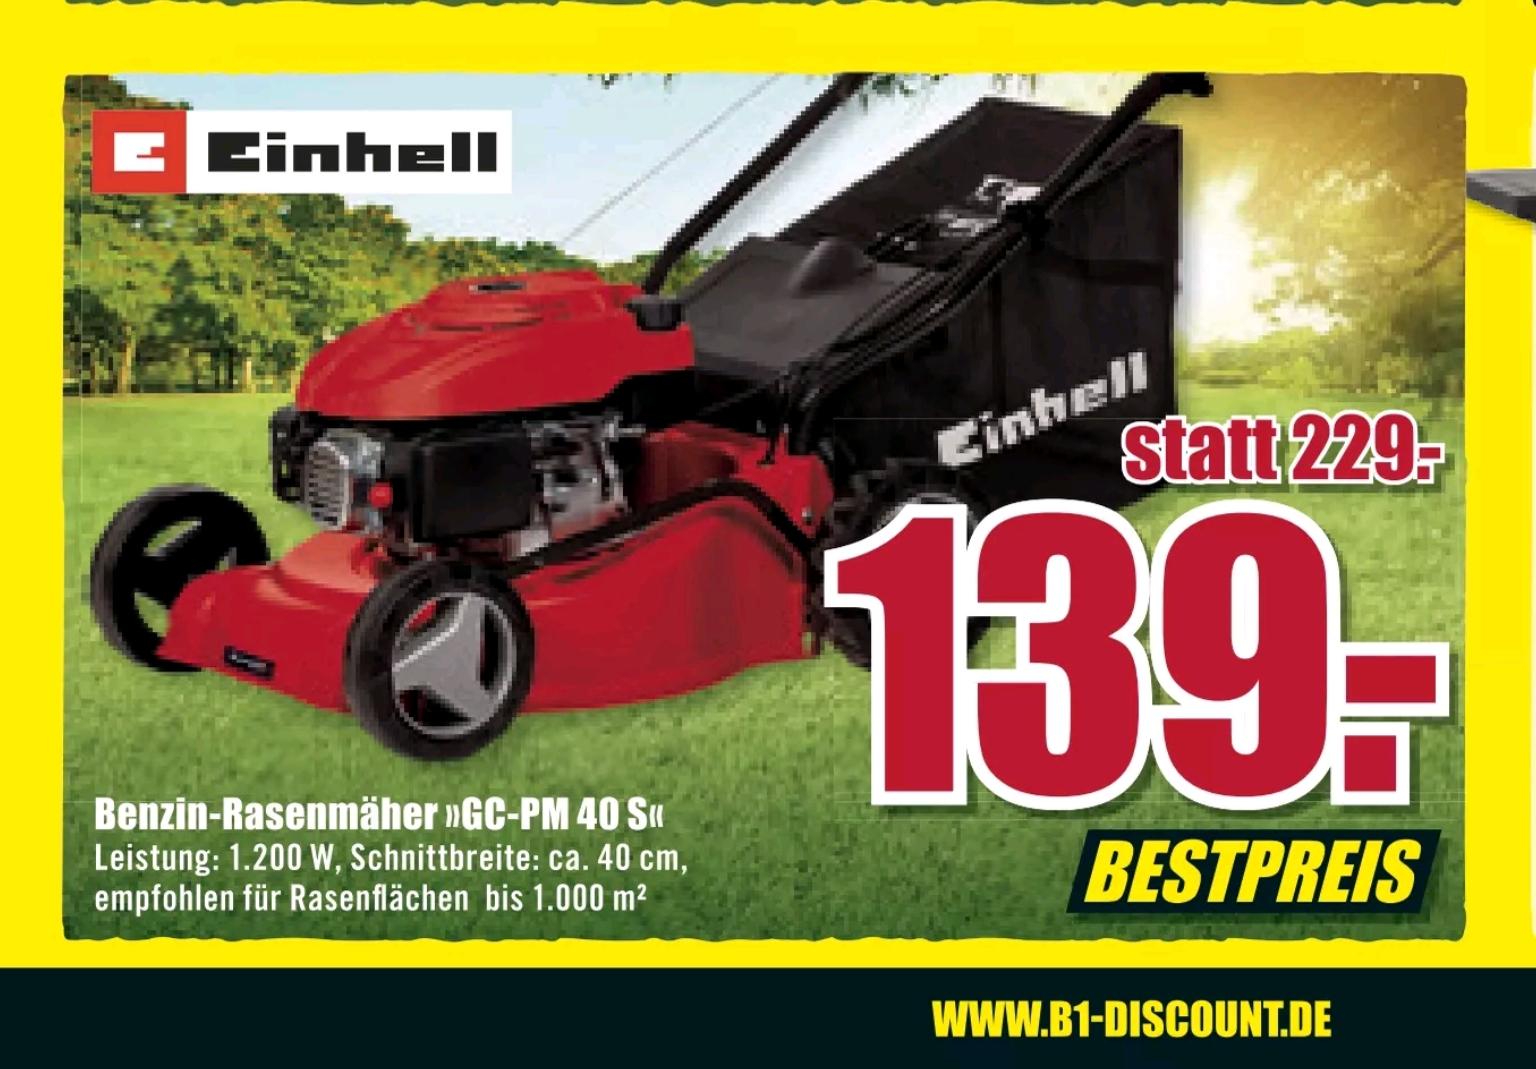 (Lokal B1 Discount Baumarkt) Benzin-Rasenmäher Einhell GC-PM 40 S